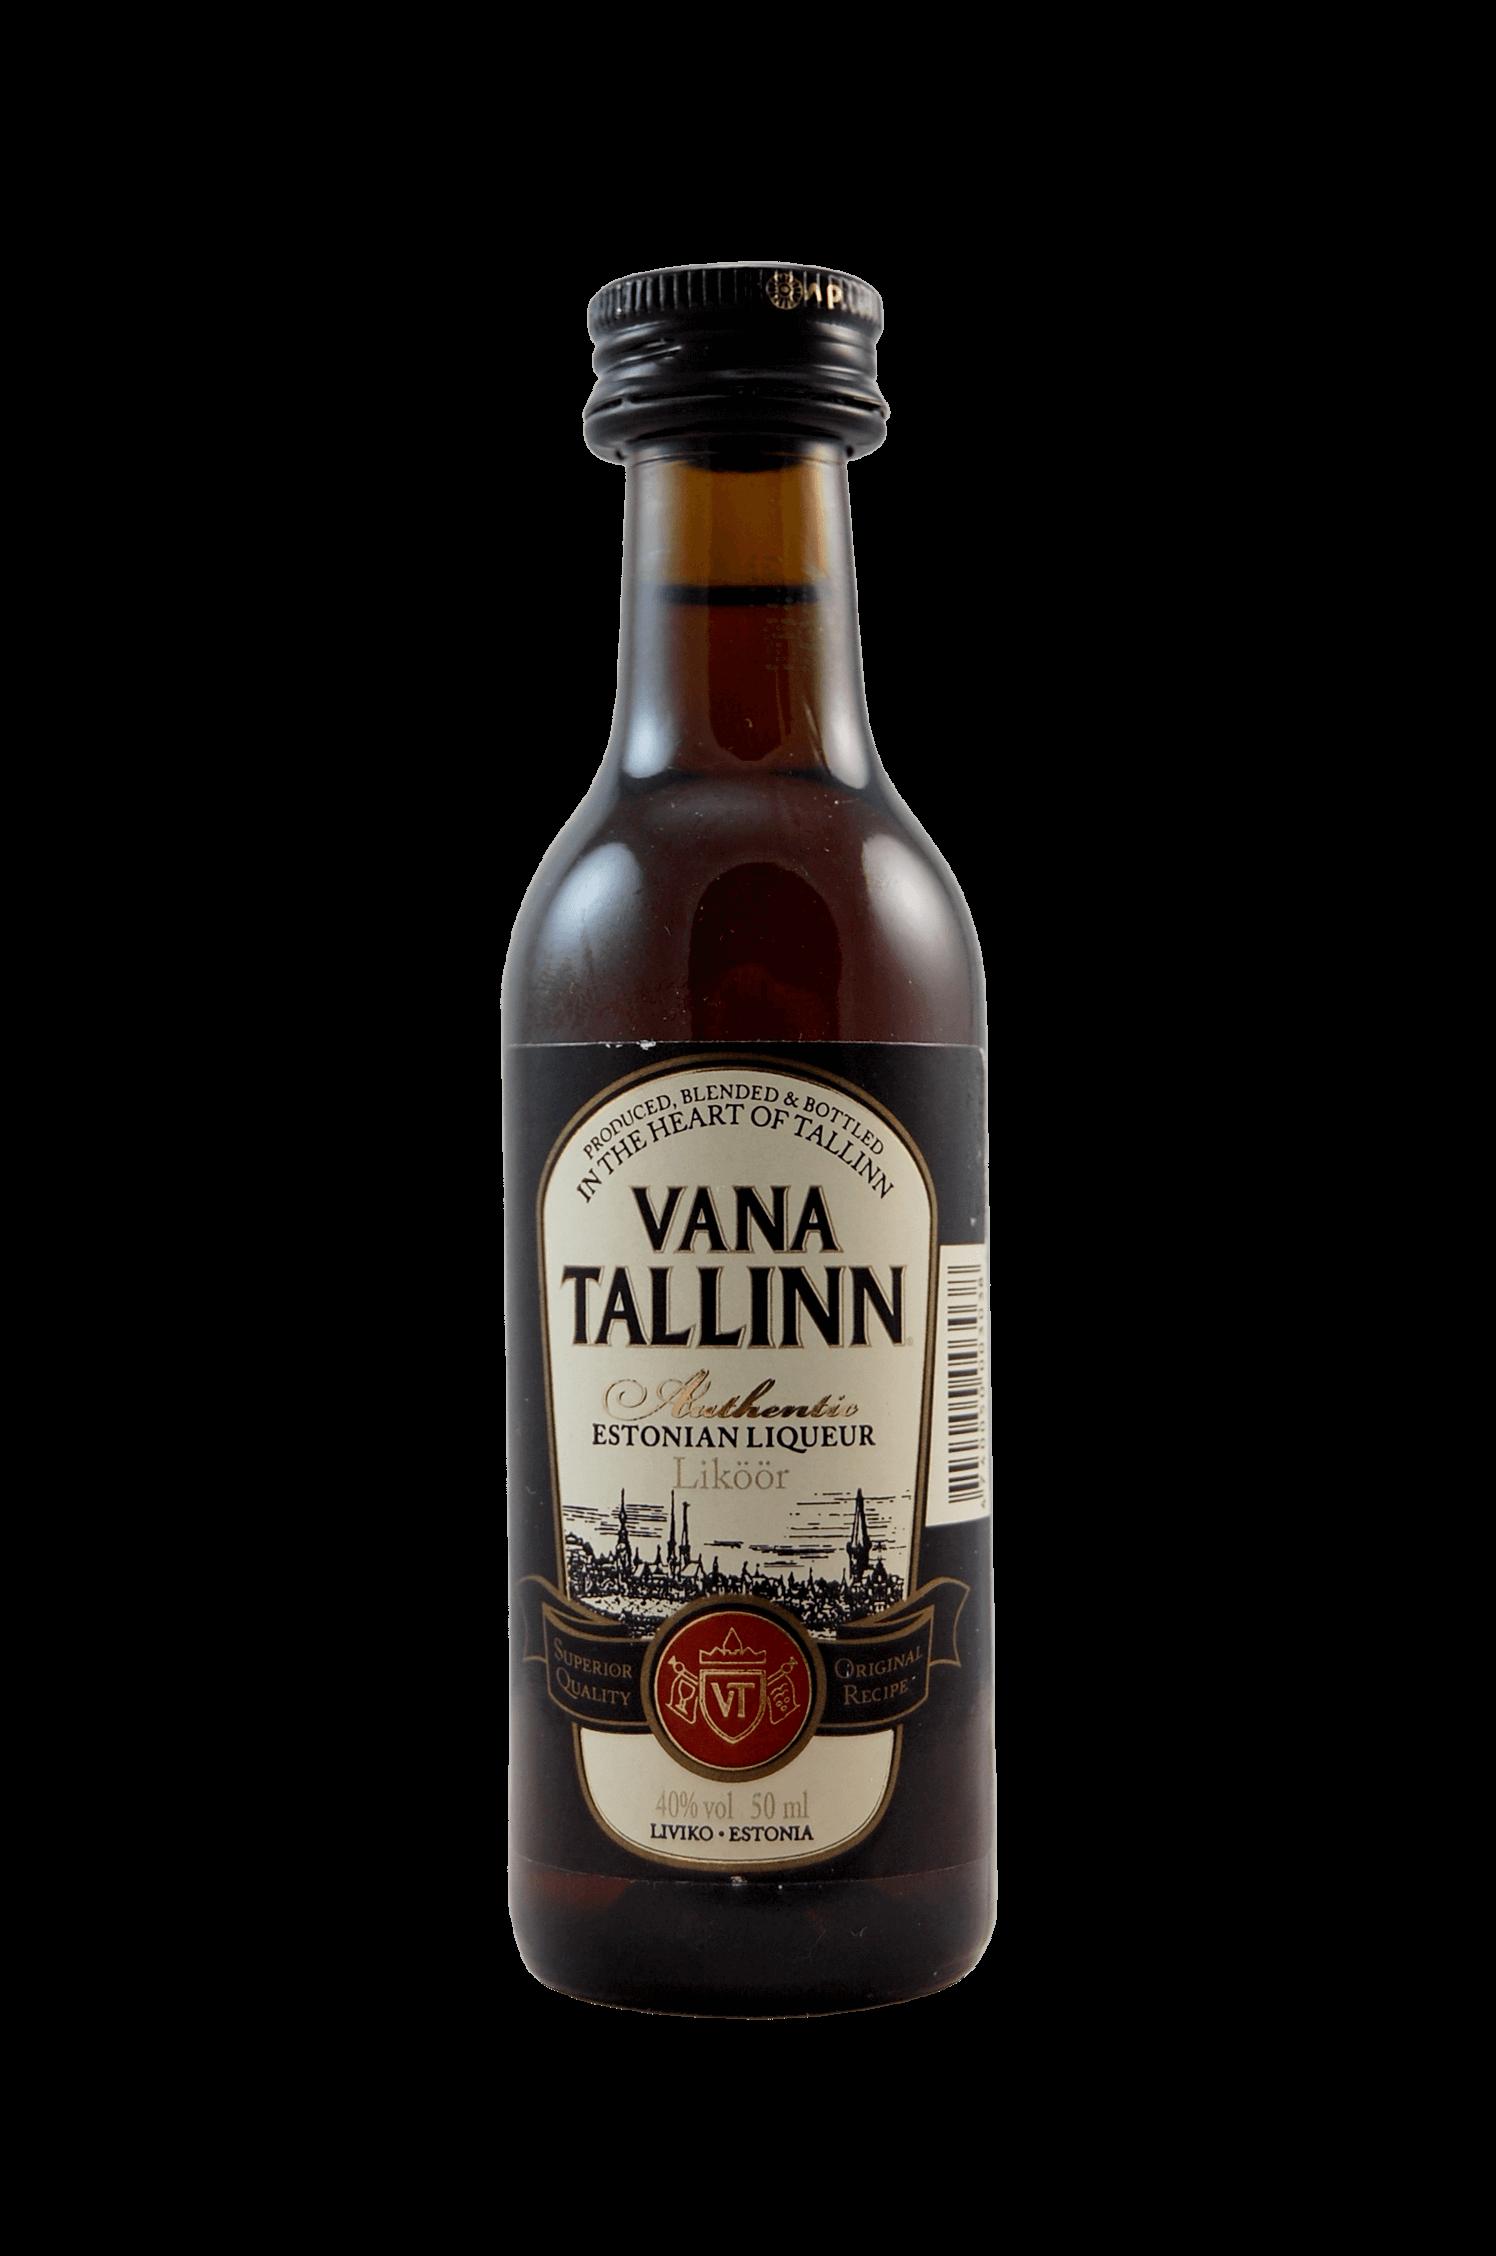 Vana Tallinn Liköör